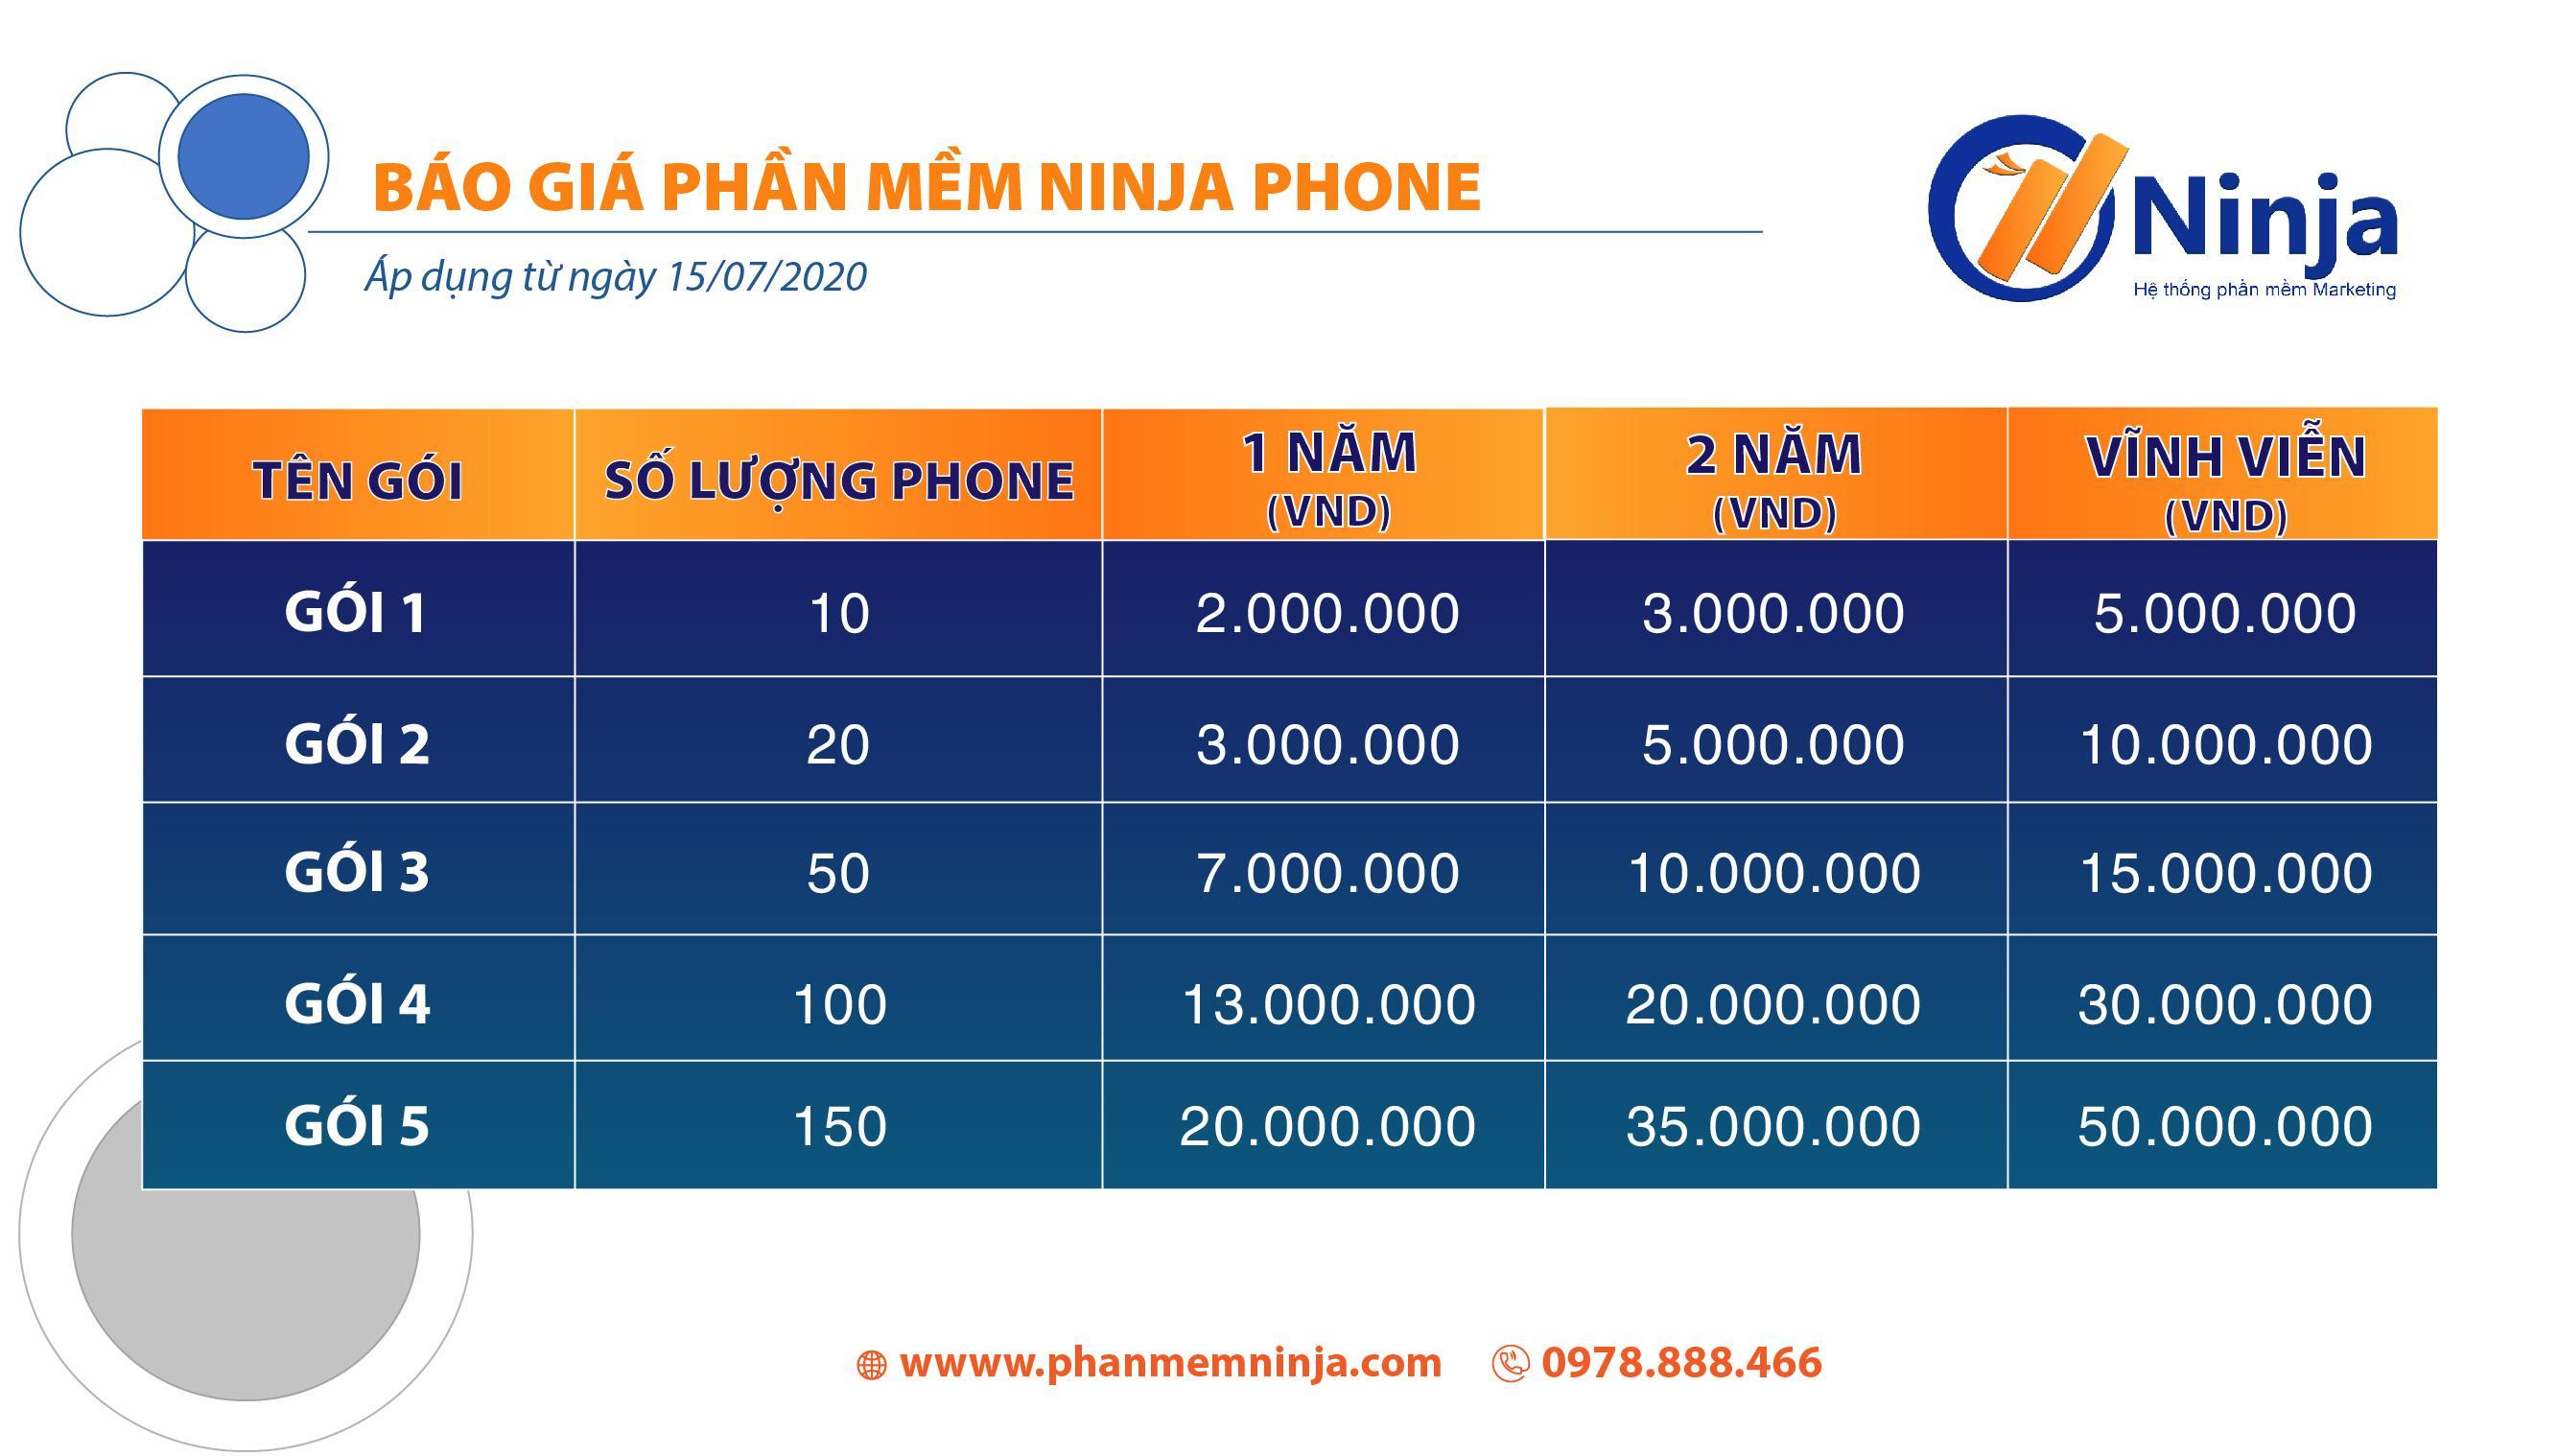 bao-gia-phan-mem-nuoi-nick-tren-dien-thoai-ninja-phone